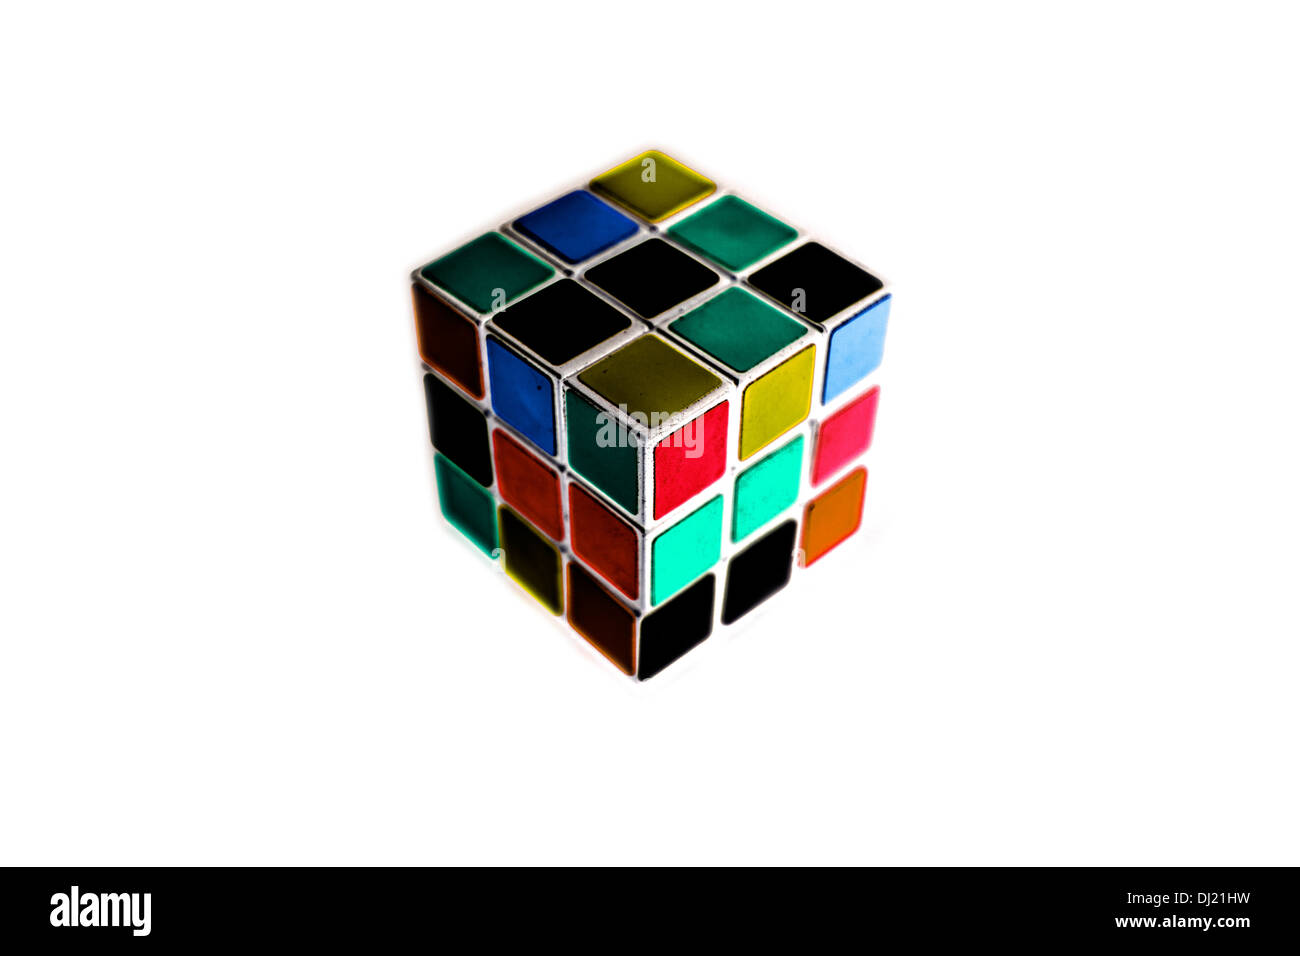 Rubik's Cube - Stock Image